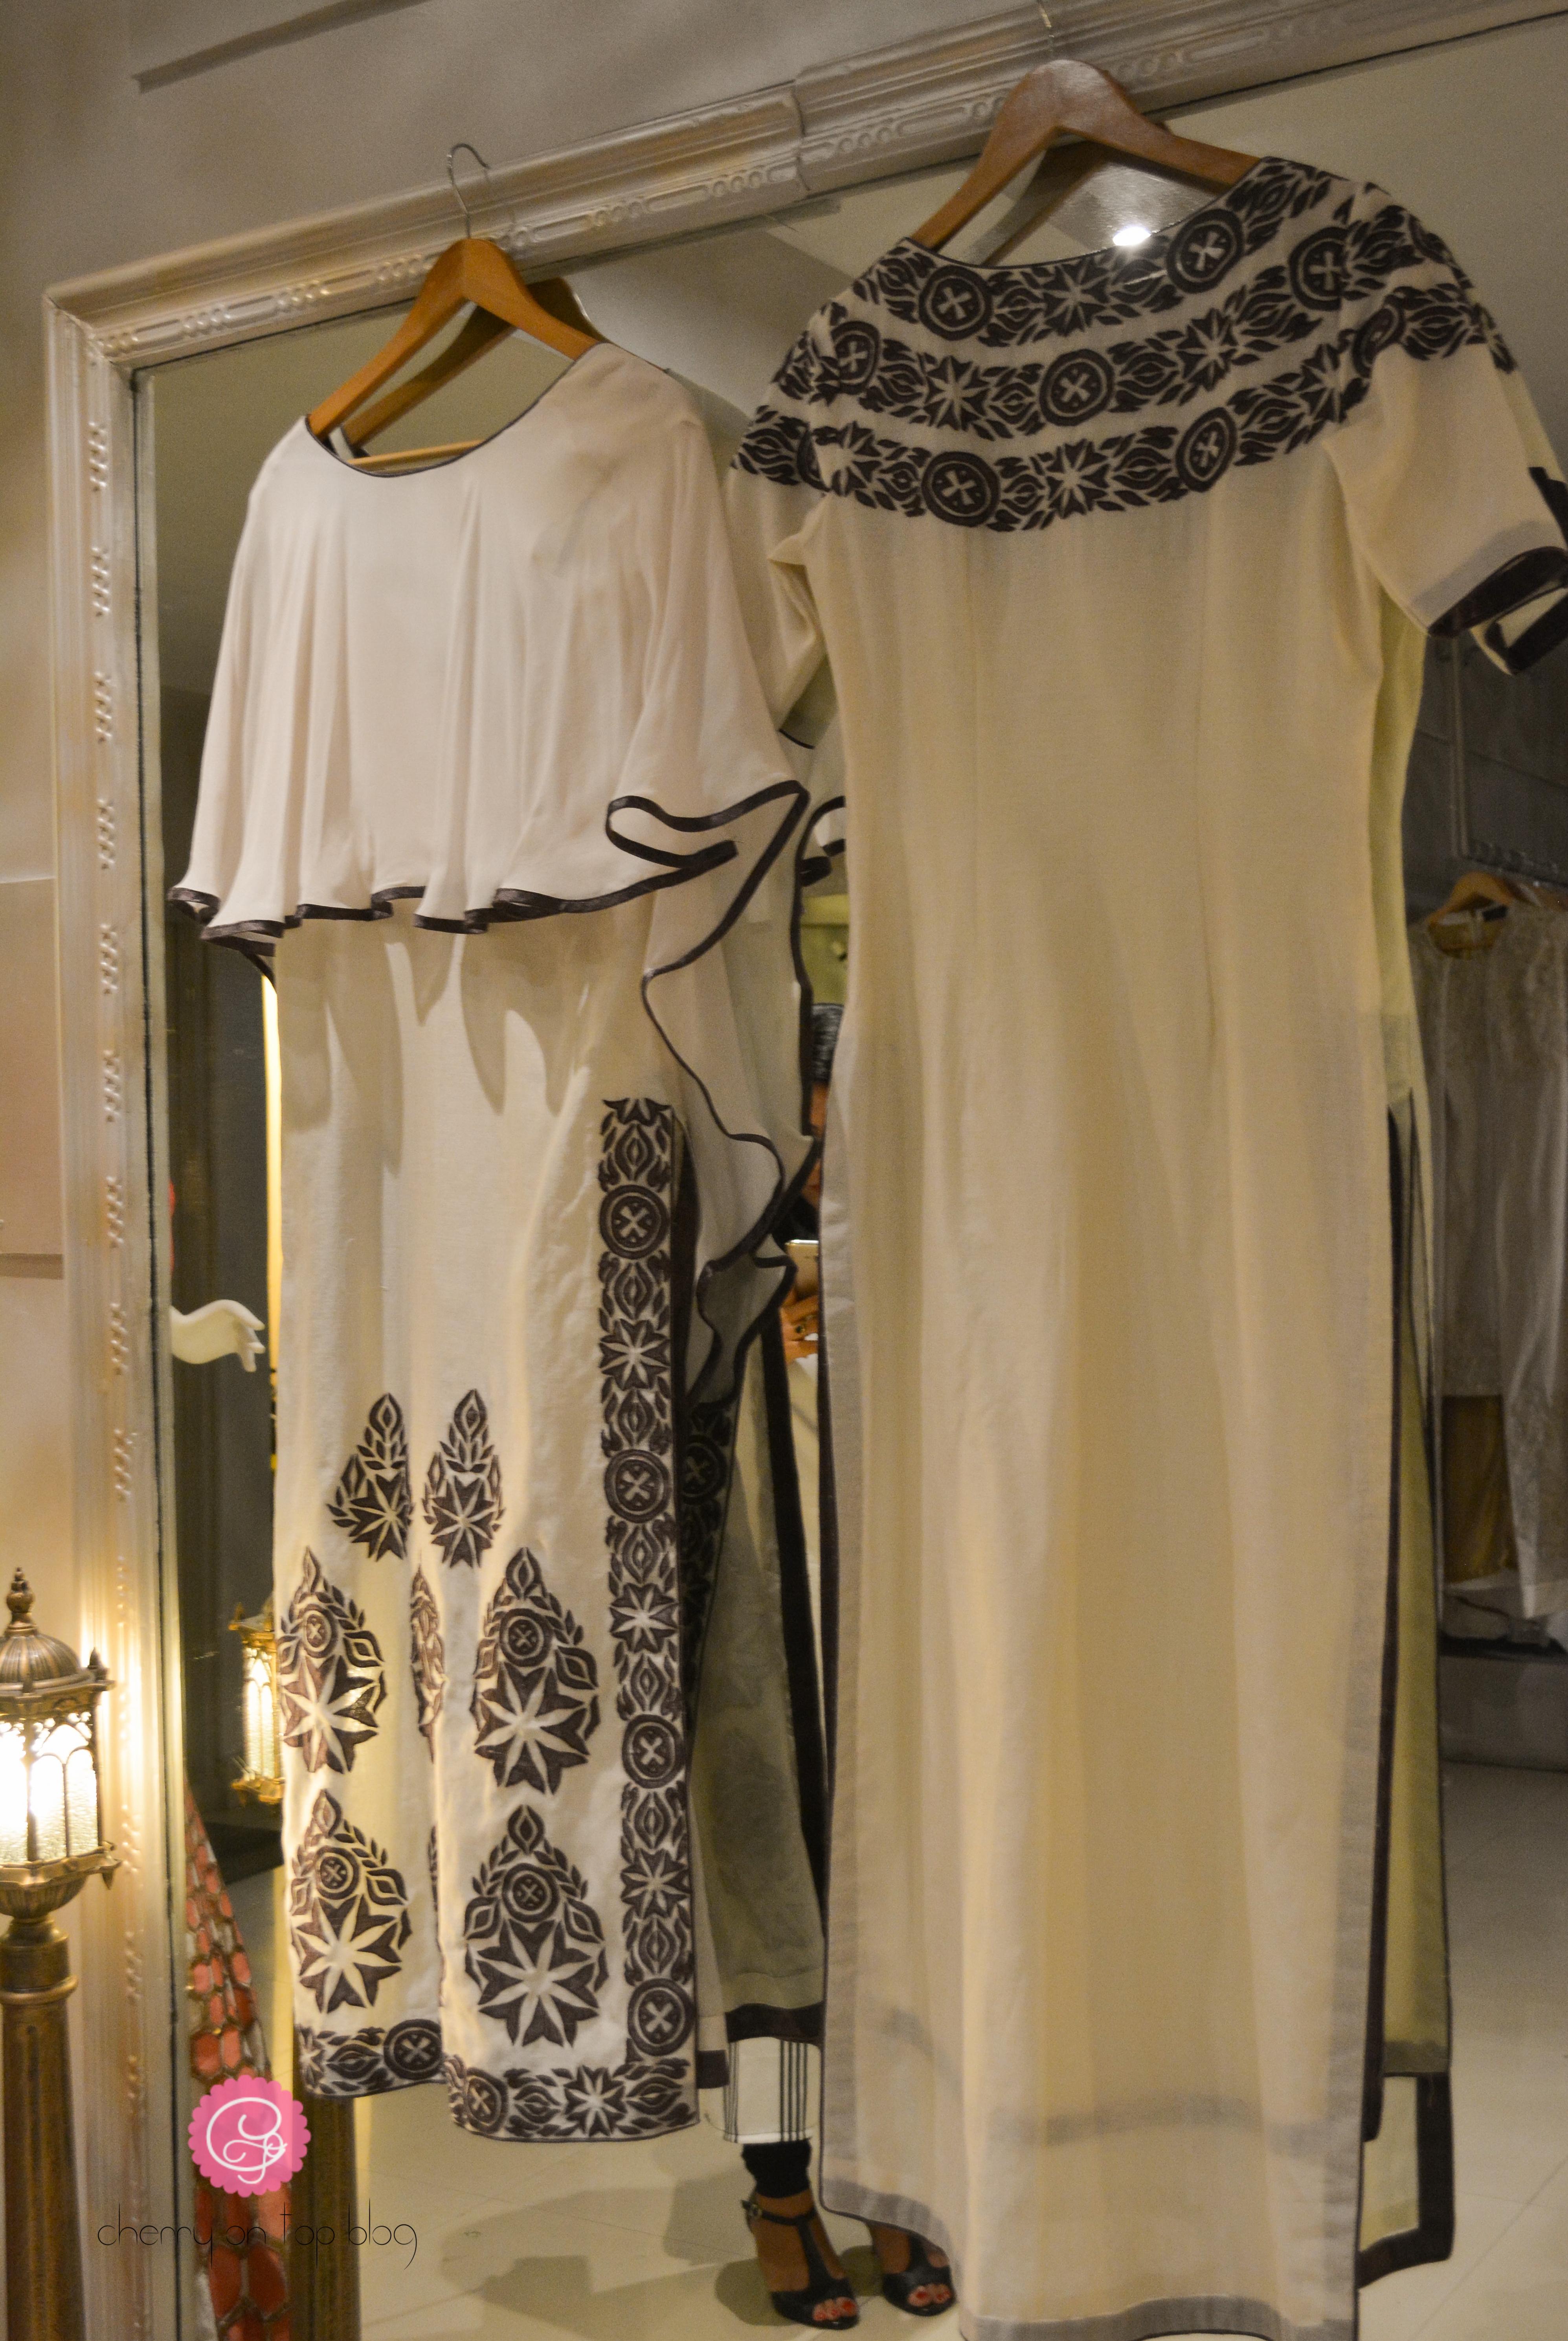 Jyoti Sachdev Iyer Spring/Summer 2016 Collection Preview| cherryontopblog.com